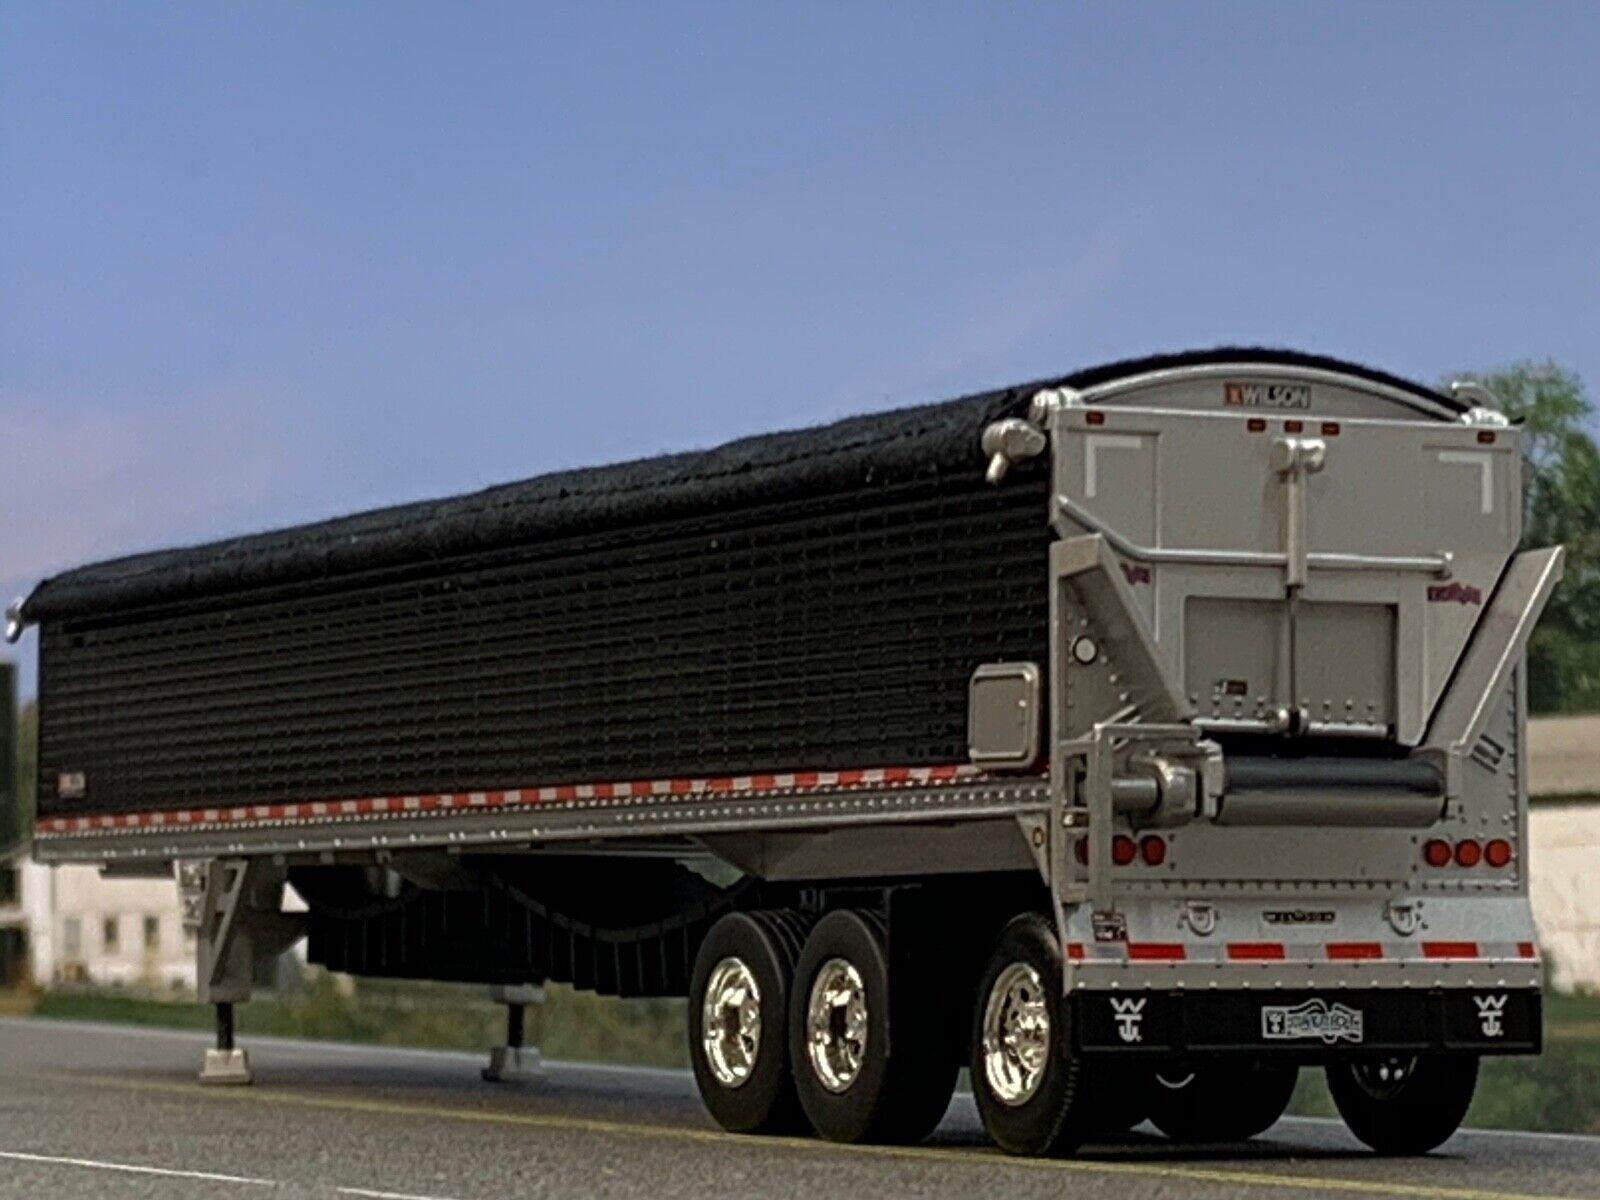 1/64 DCP BLACK WILSON PATRIOT TRI-AXLE (SUPER SINGLES) BELT TRAILER W/ BLK TARP 1